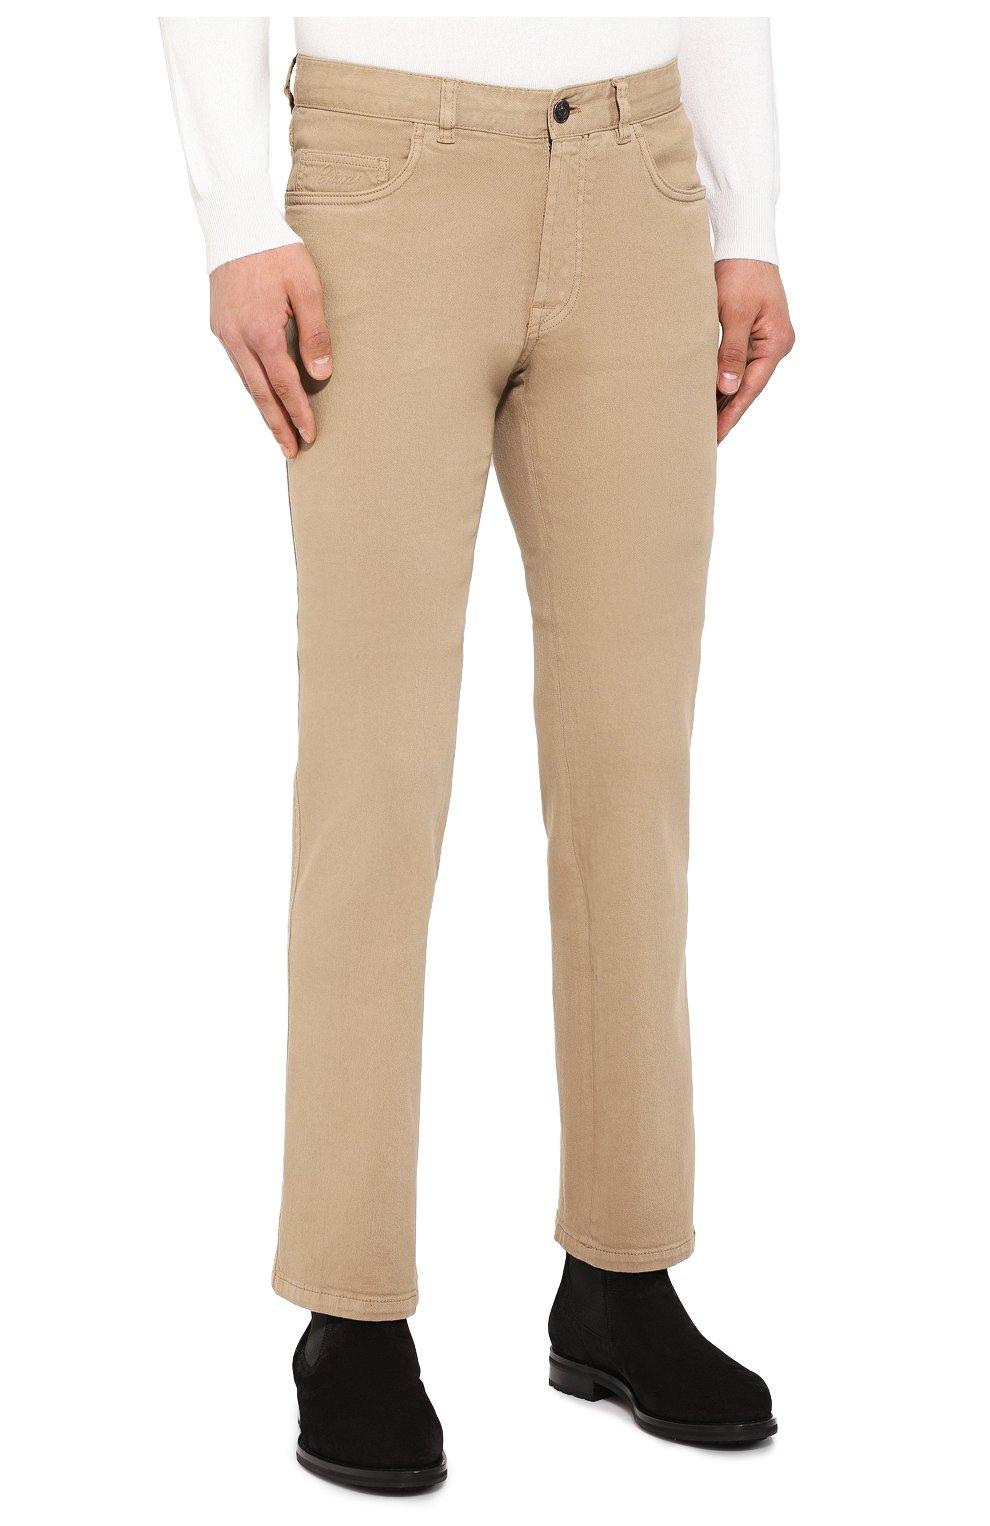 Мужские джинсы BRIONI бежевого цвета, арт. SPNJ0M/08T01/STELVI0 | Фото 3